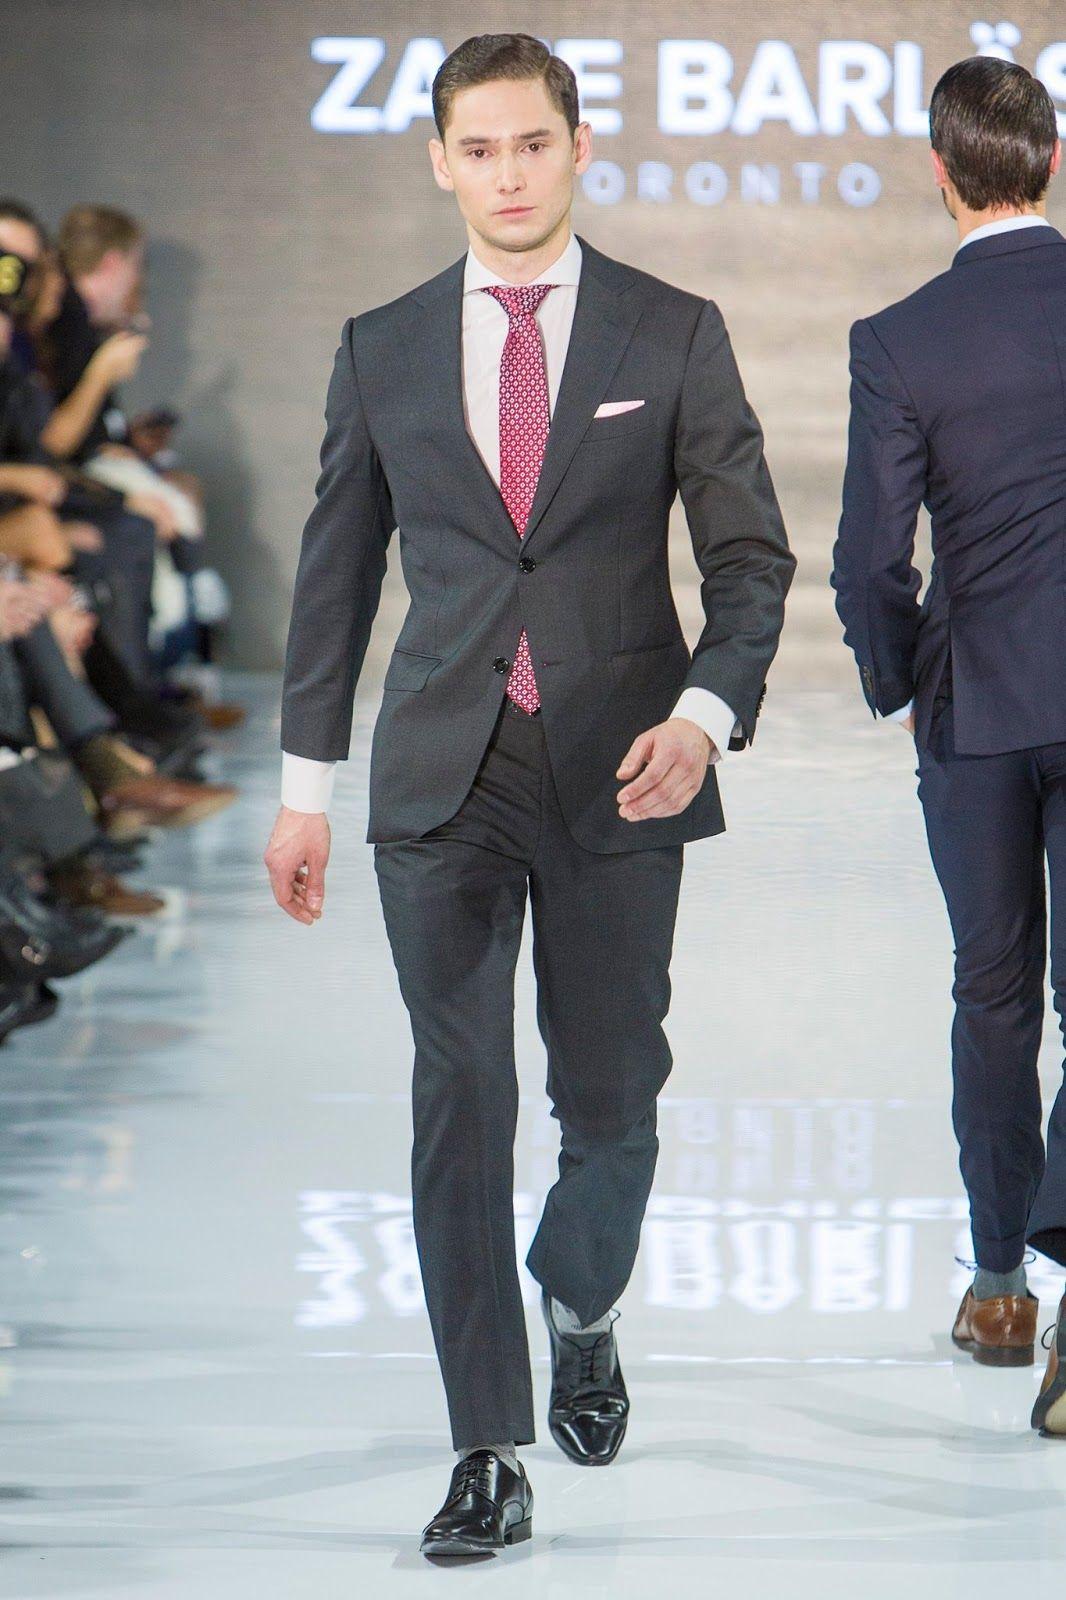 Zane Barlas Fall/Winter 2016 - Toronto Men's Fashion Week